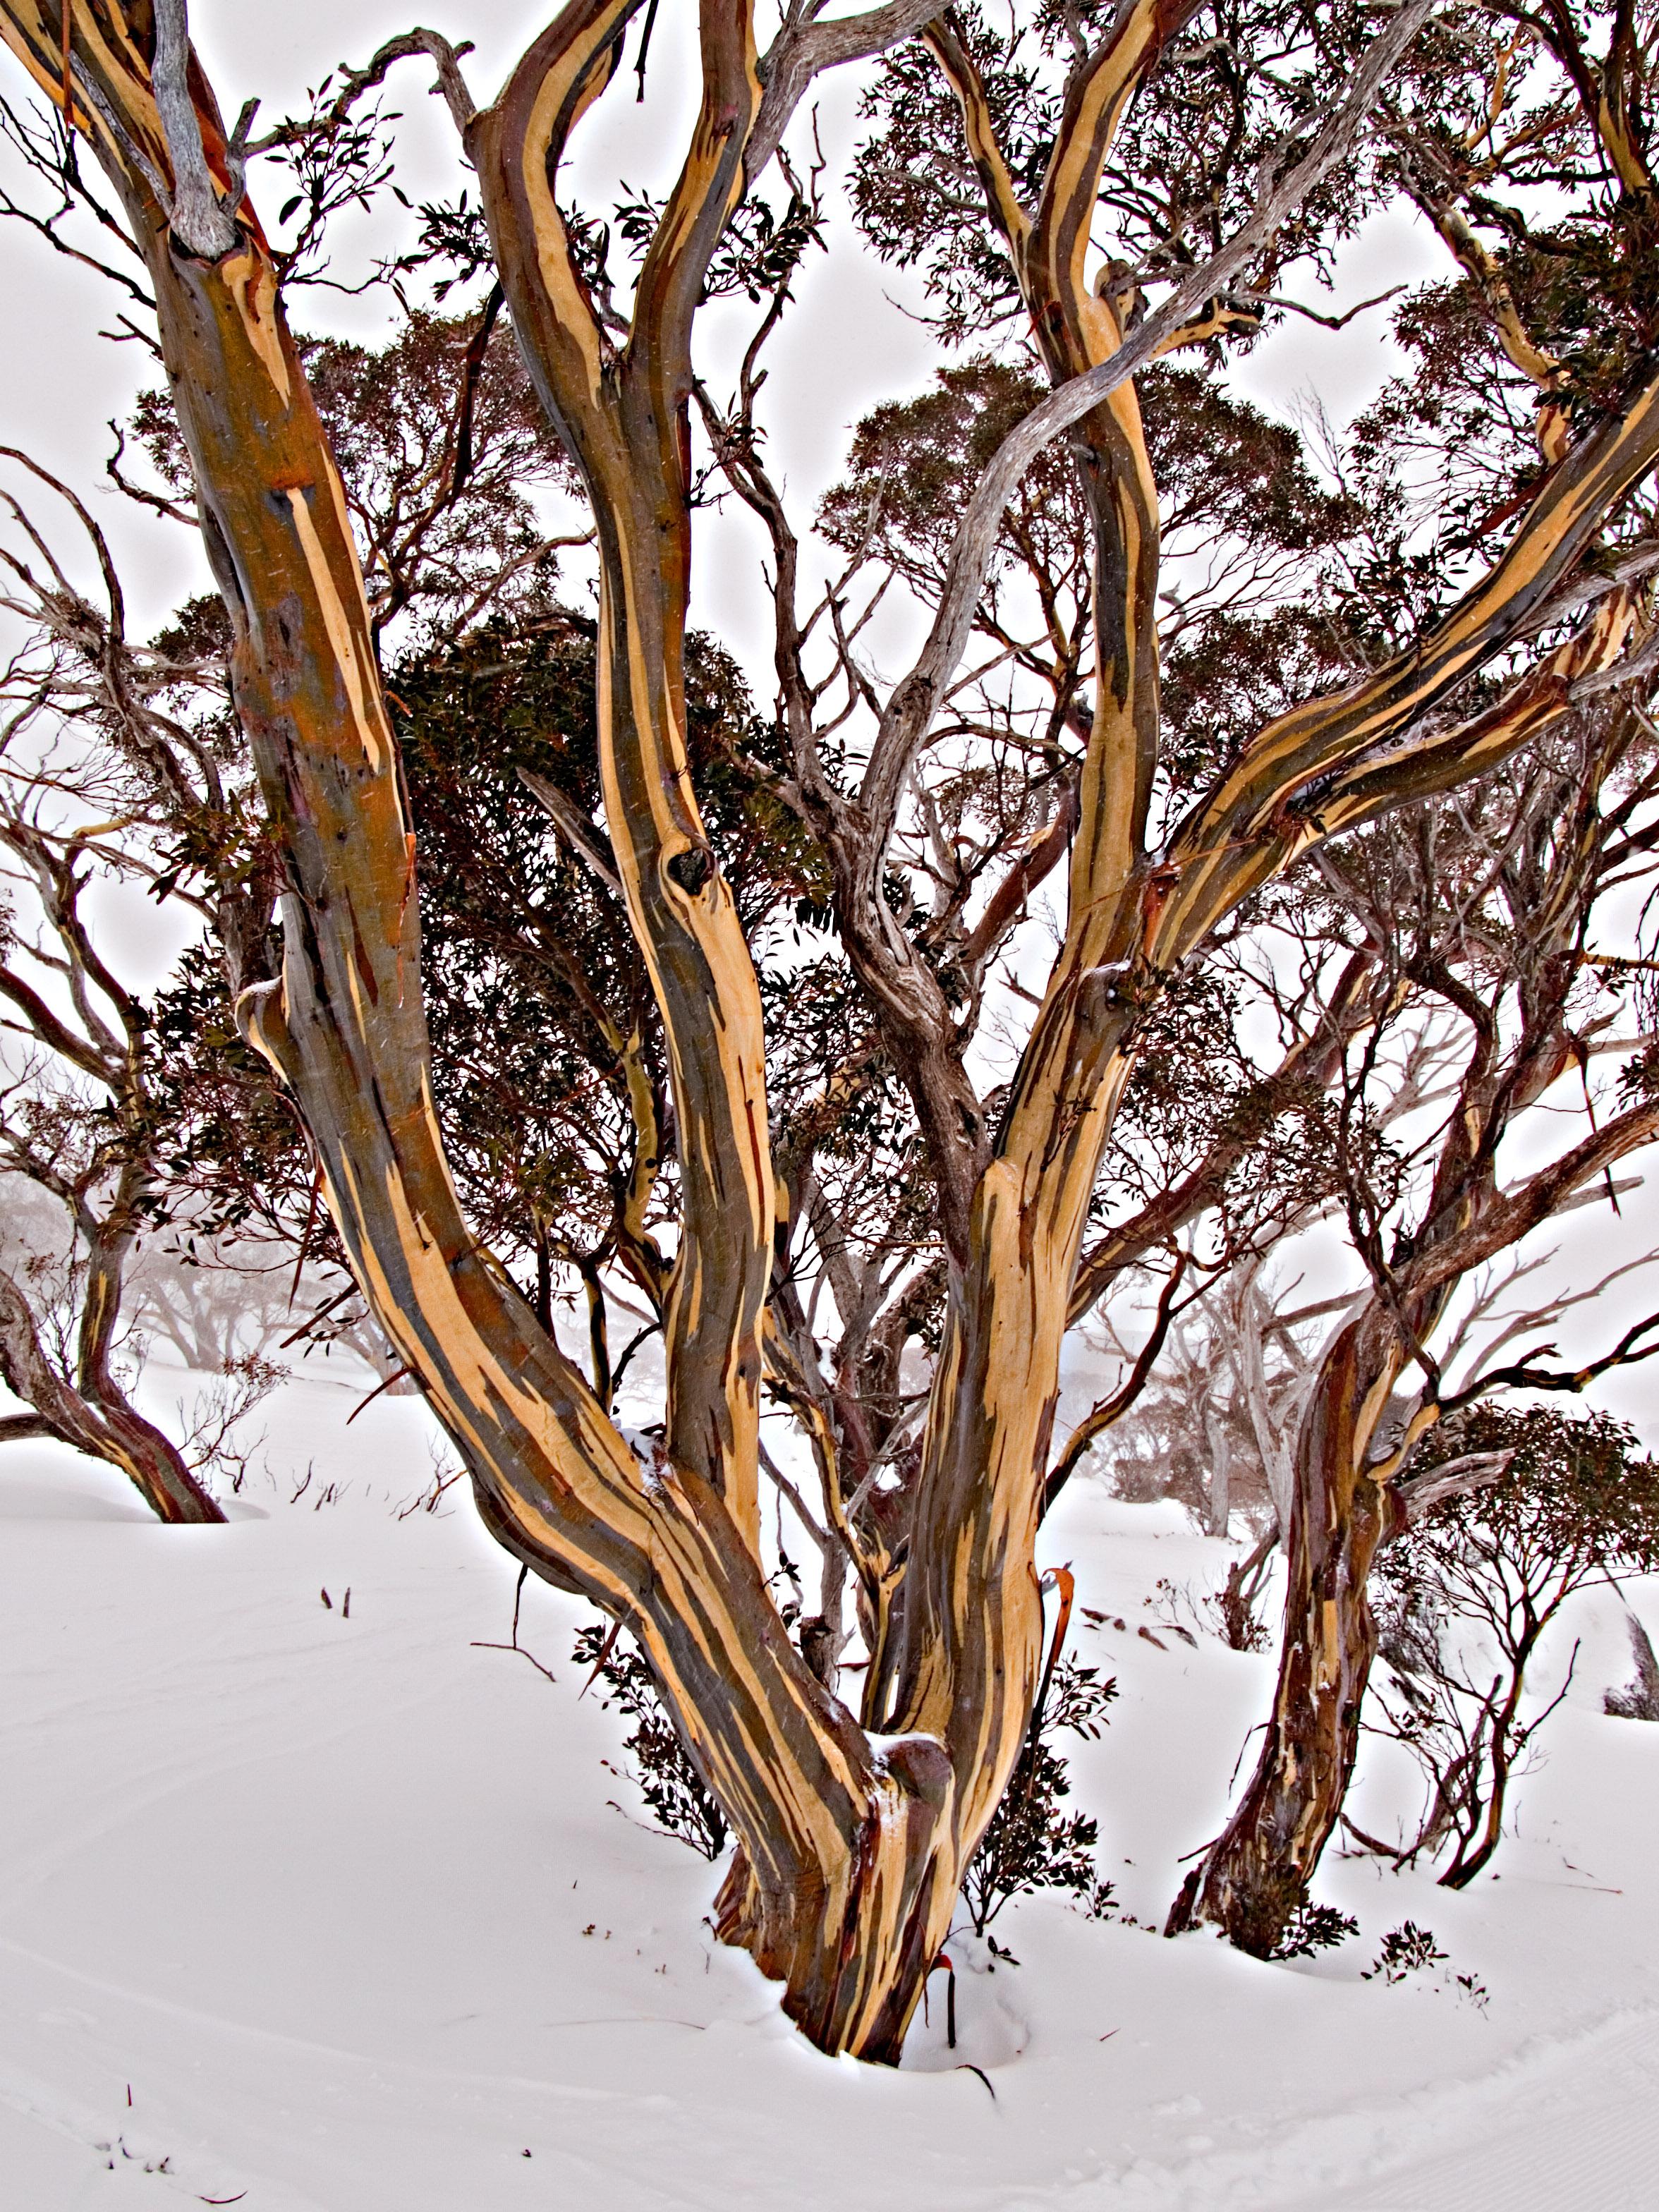 Iconic tree of Australian Alps - Snow Gum   Eucalyptus pauci…   Flickr